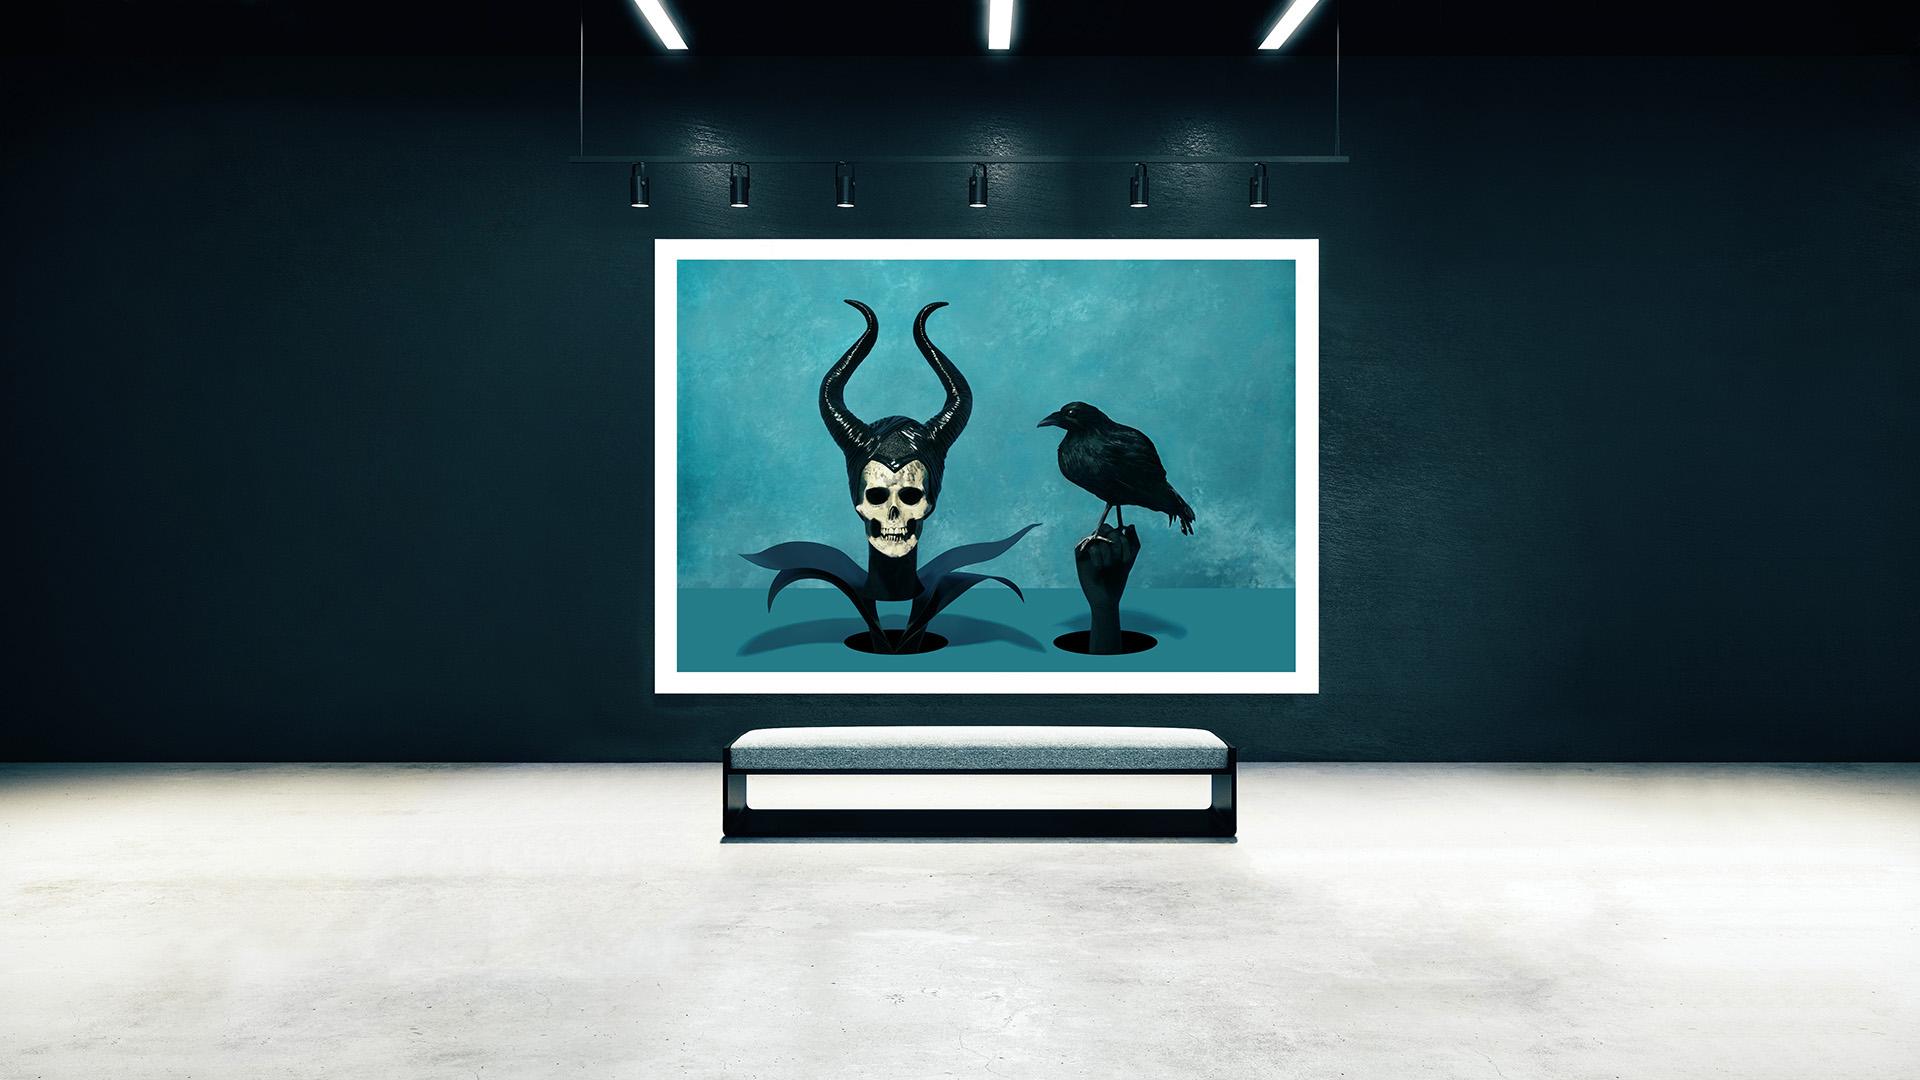 Exposicion-Sintora-Memento-mori-bruja-malefica-cuervo-Horno-Art-Virtual-Gallery-galeria-arte-fotografia-artistica-decorativa